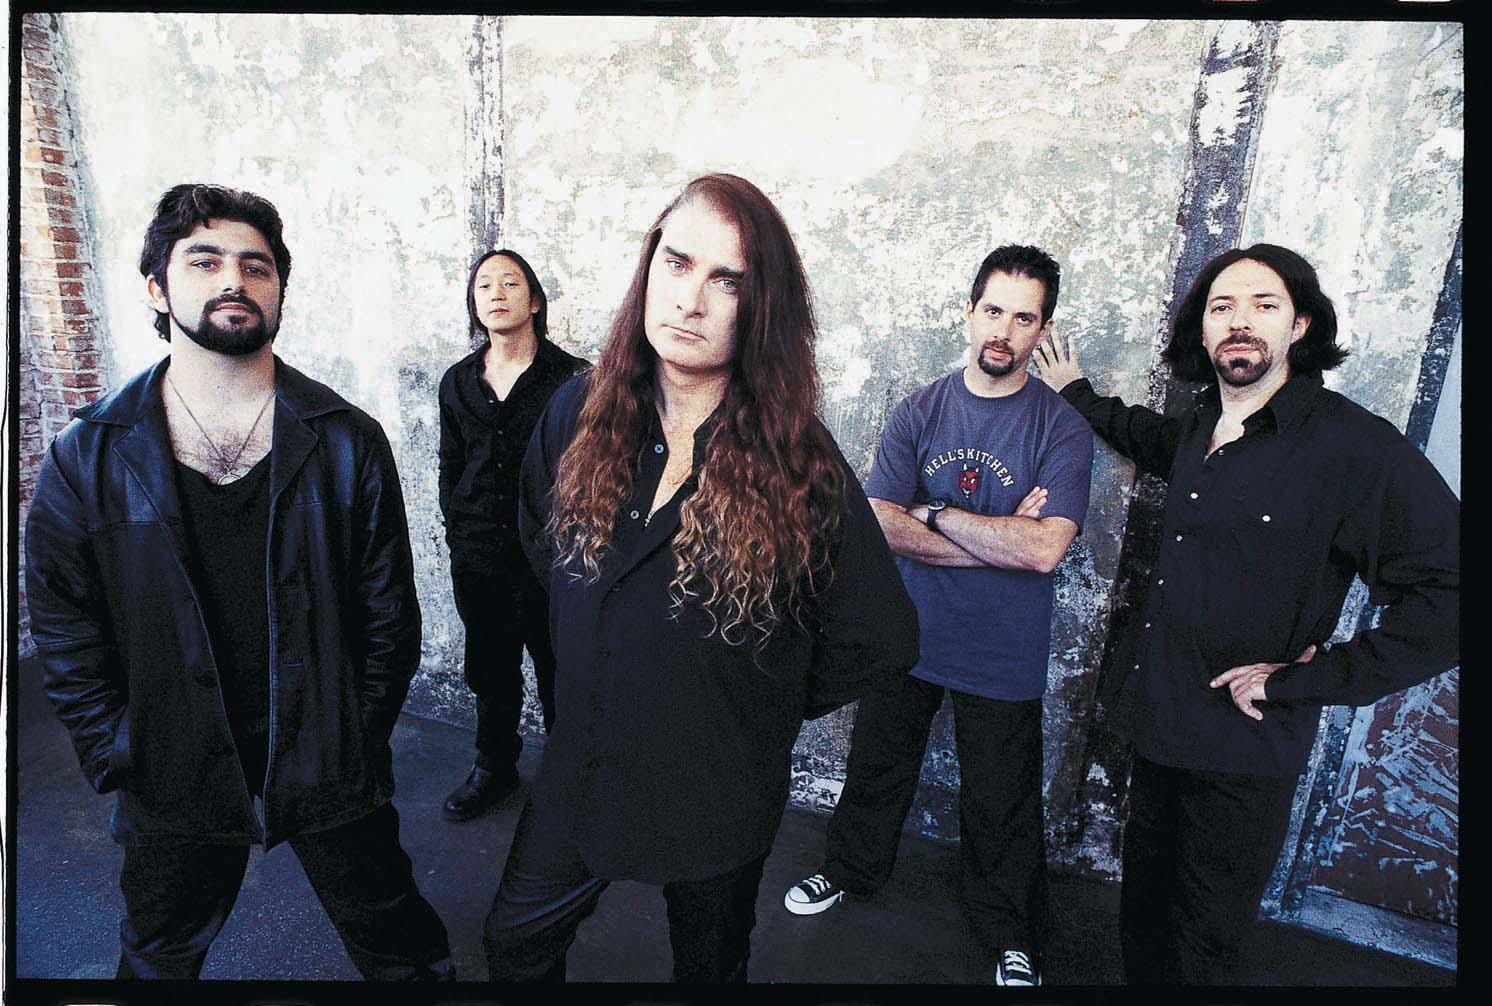 Dream Theater em 1999: Mike Portnoy, John Myung, James LaBrie, John Petrucci e Jordan Rudess